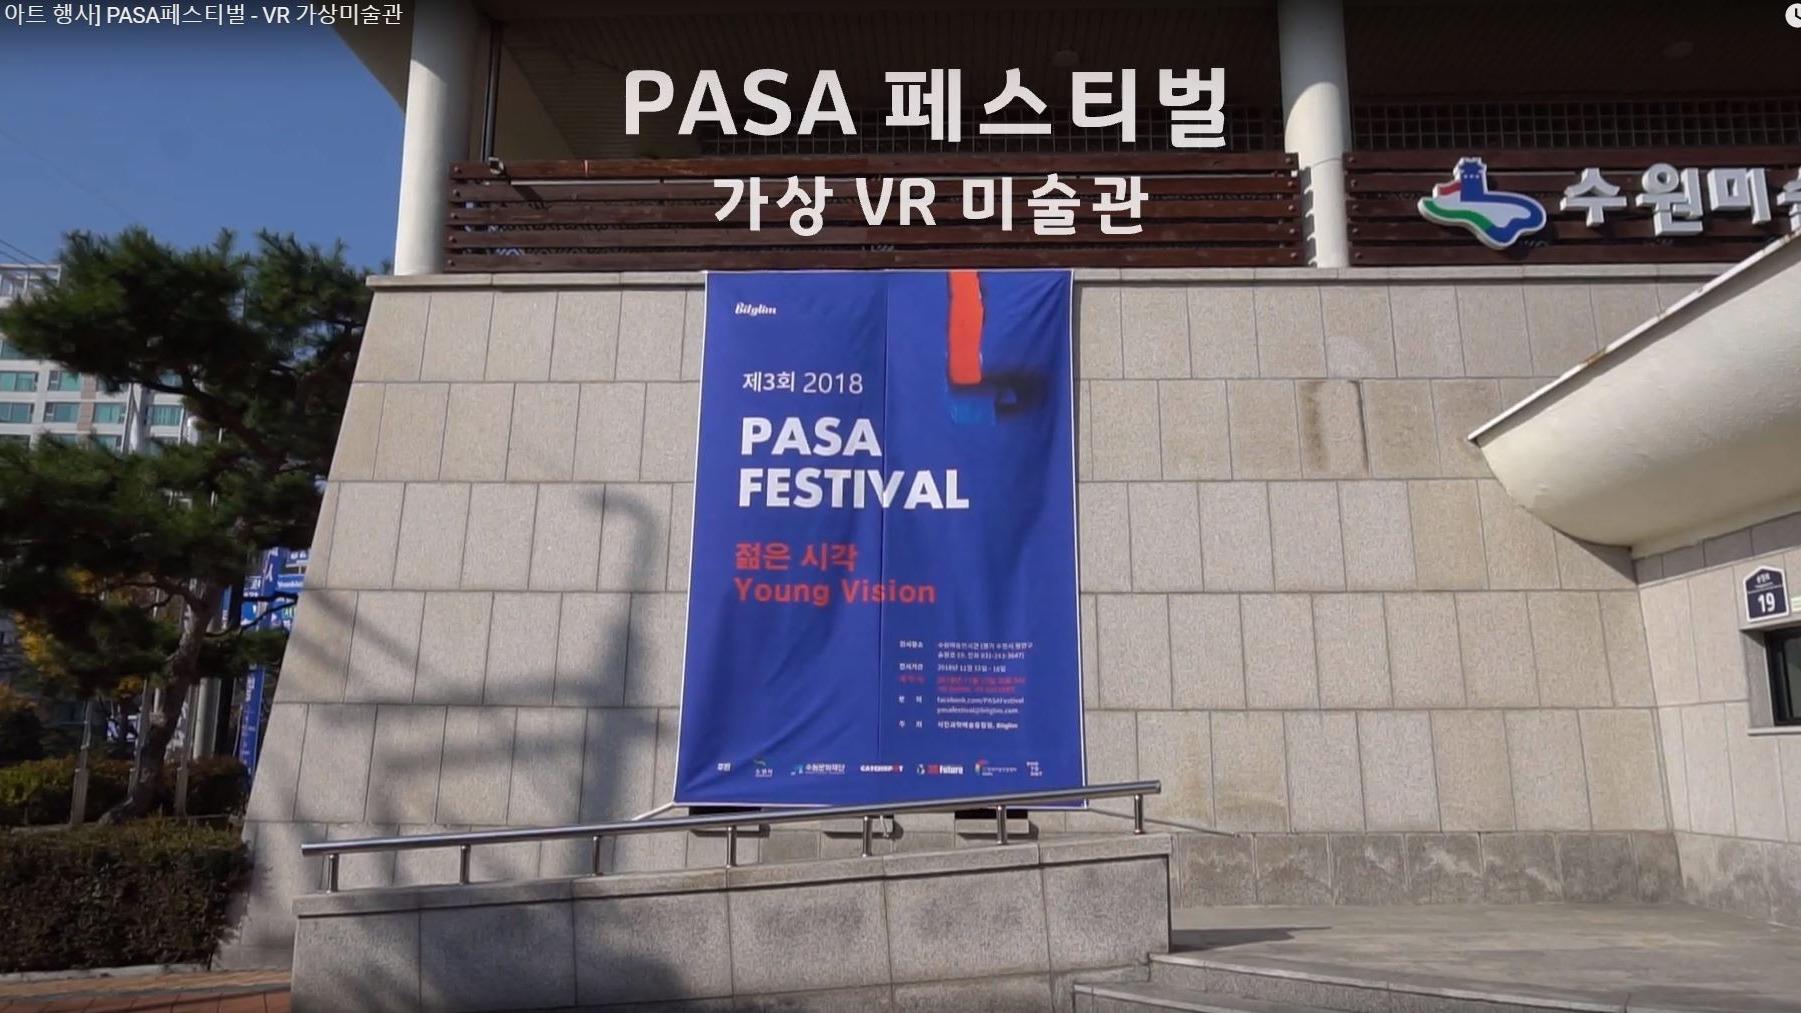 PASA 페스티벌 2018